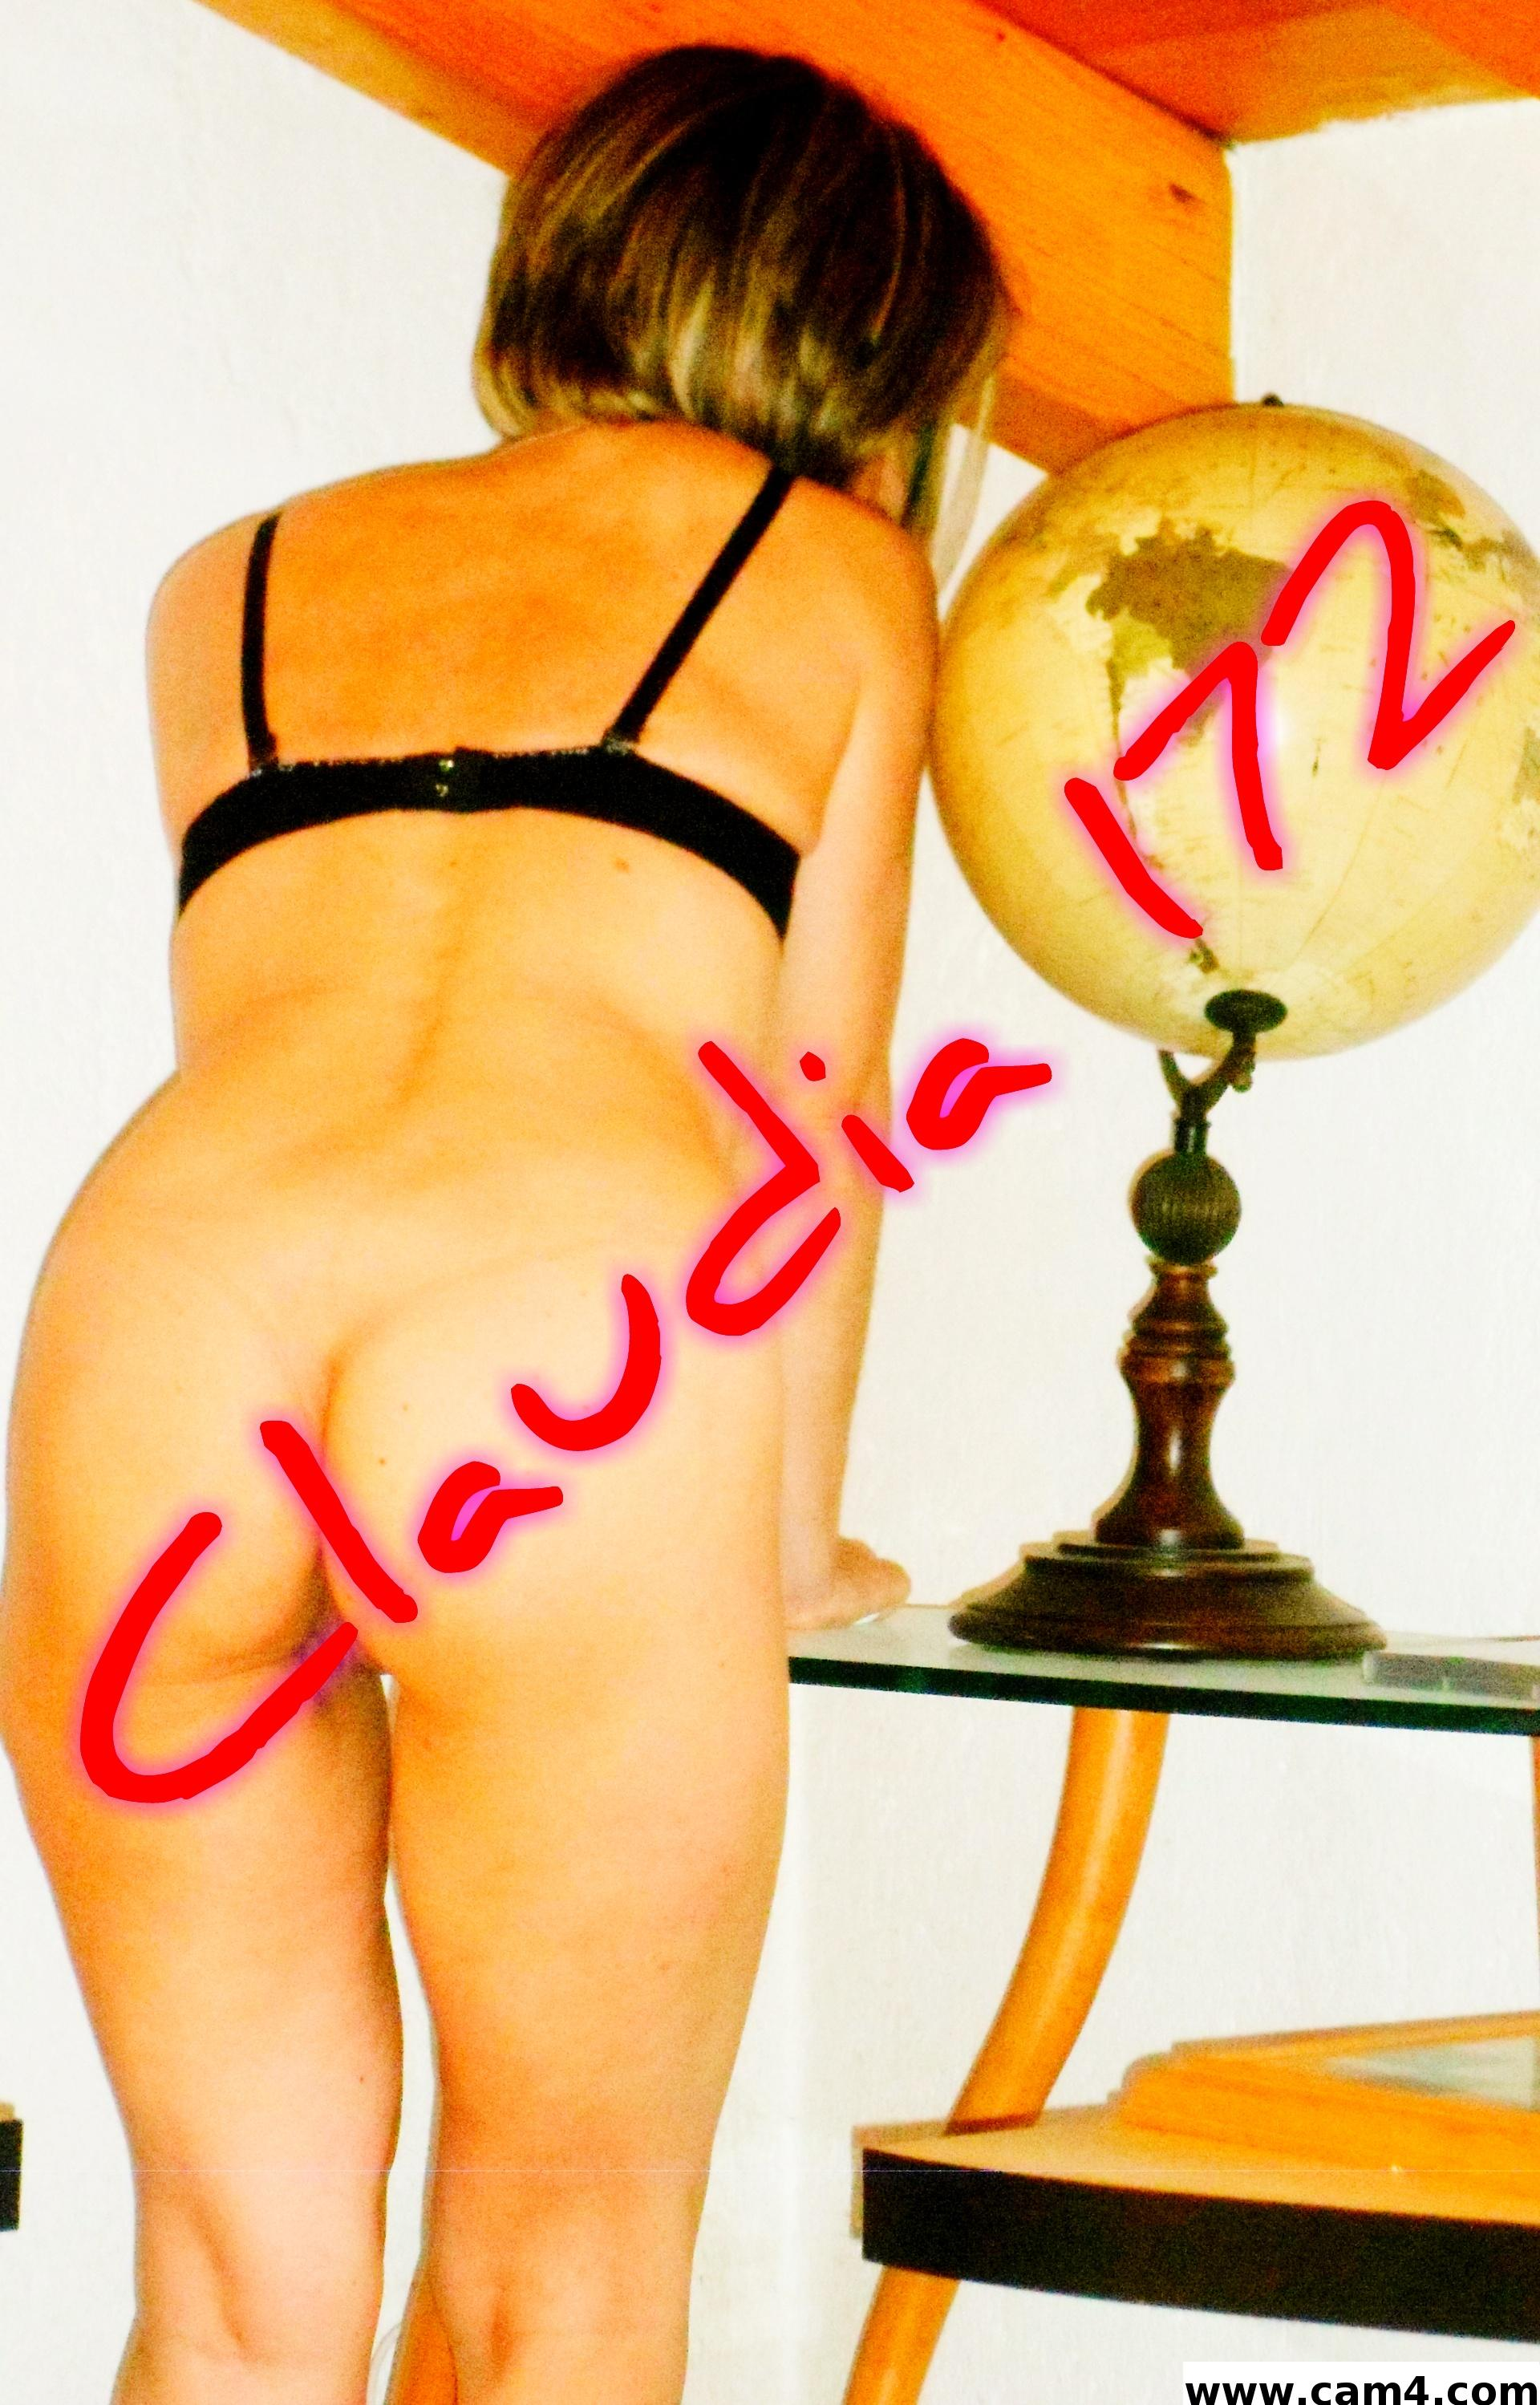 Claudia172?s=k8ytht+imhwhssa6qjk4lpj184fxlsfcznhz1xe04ds=